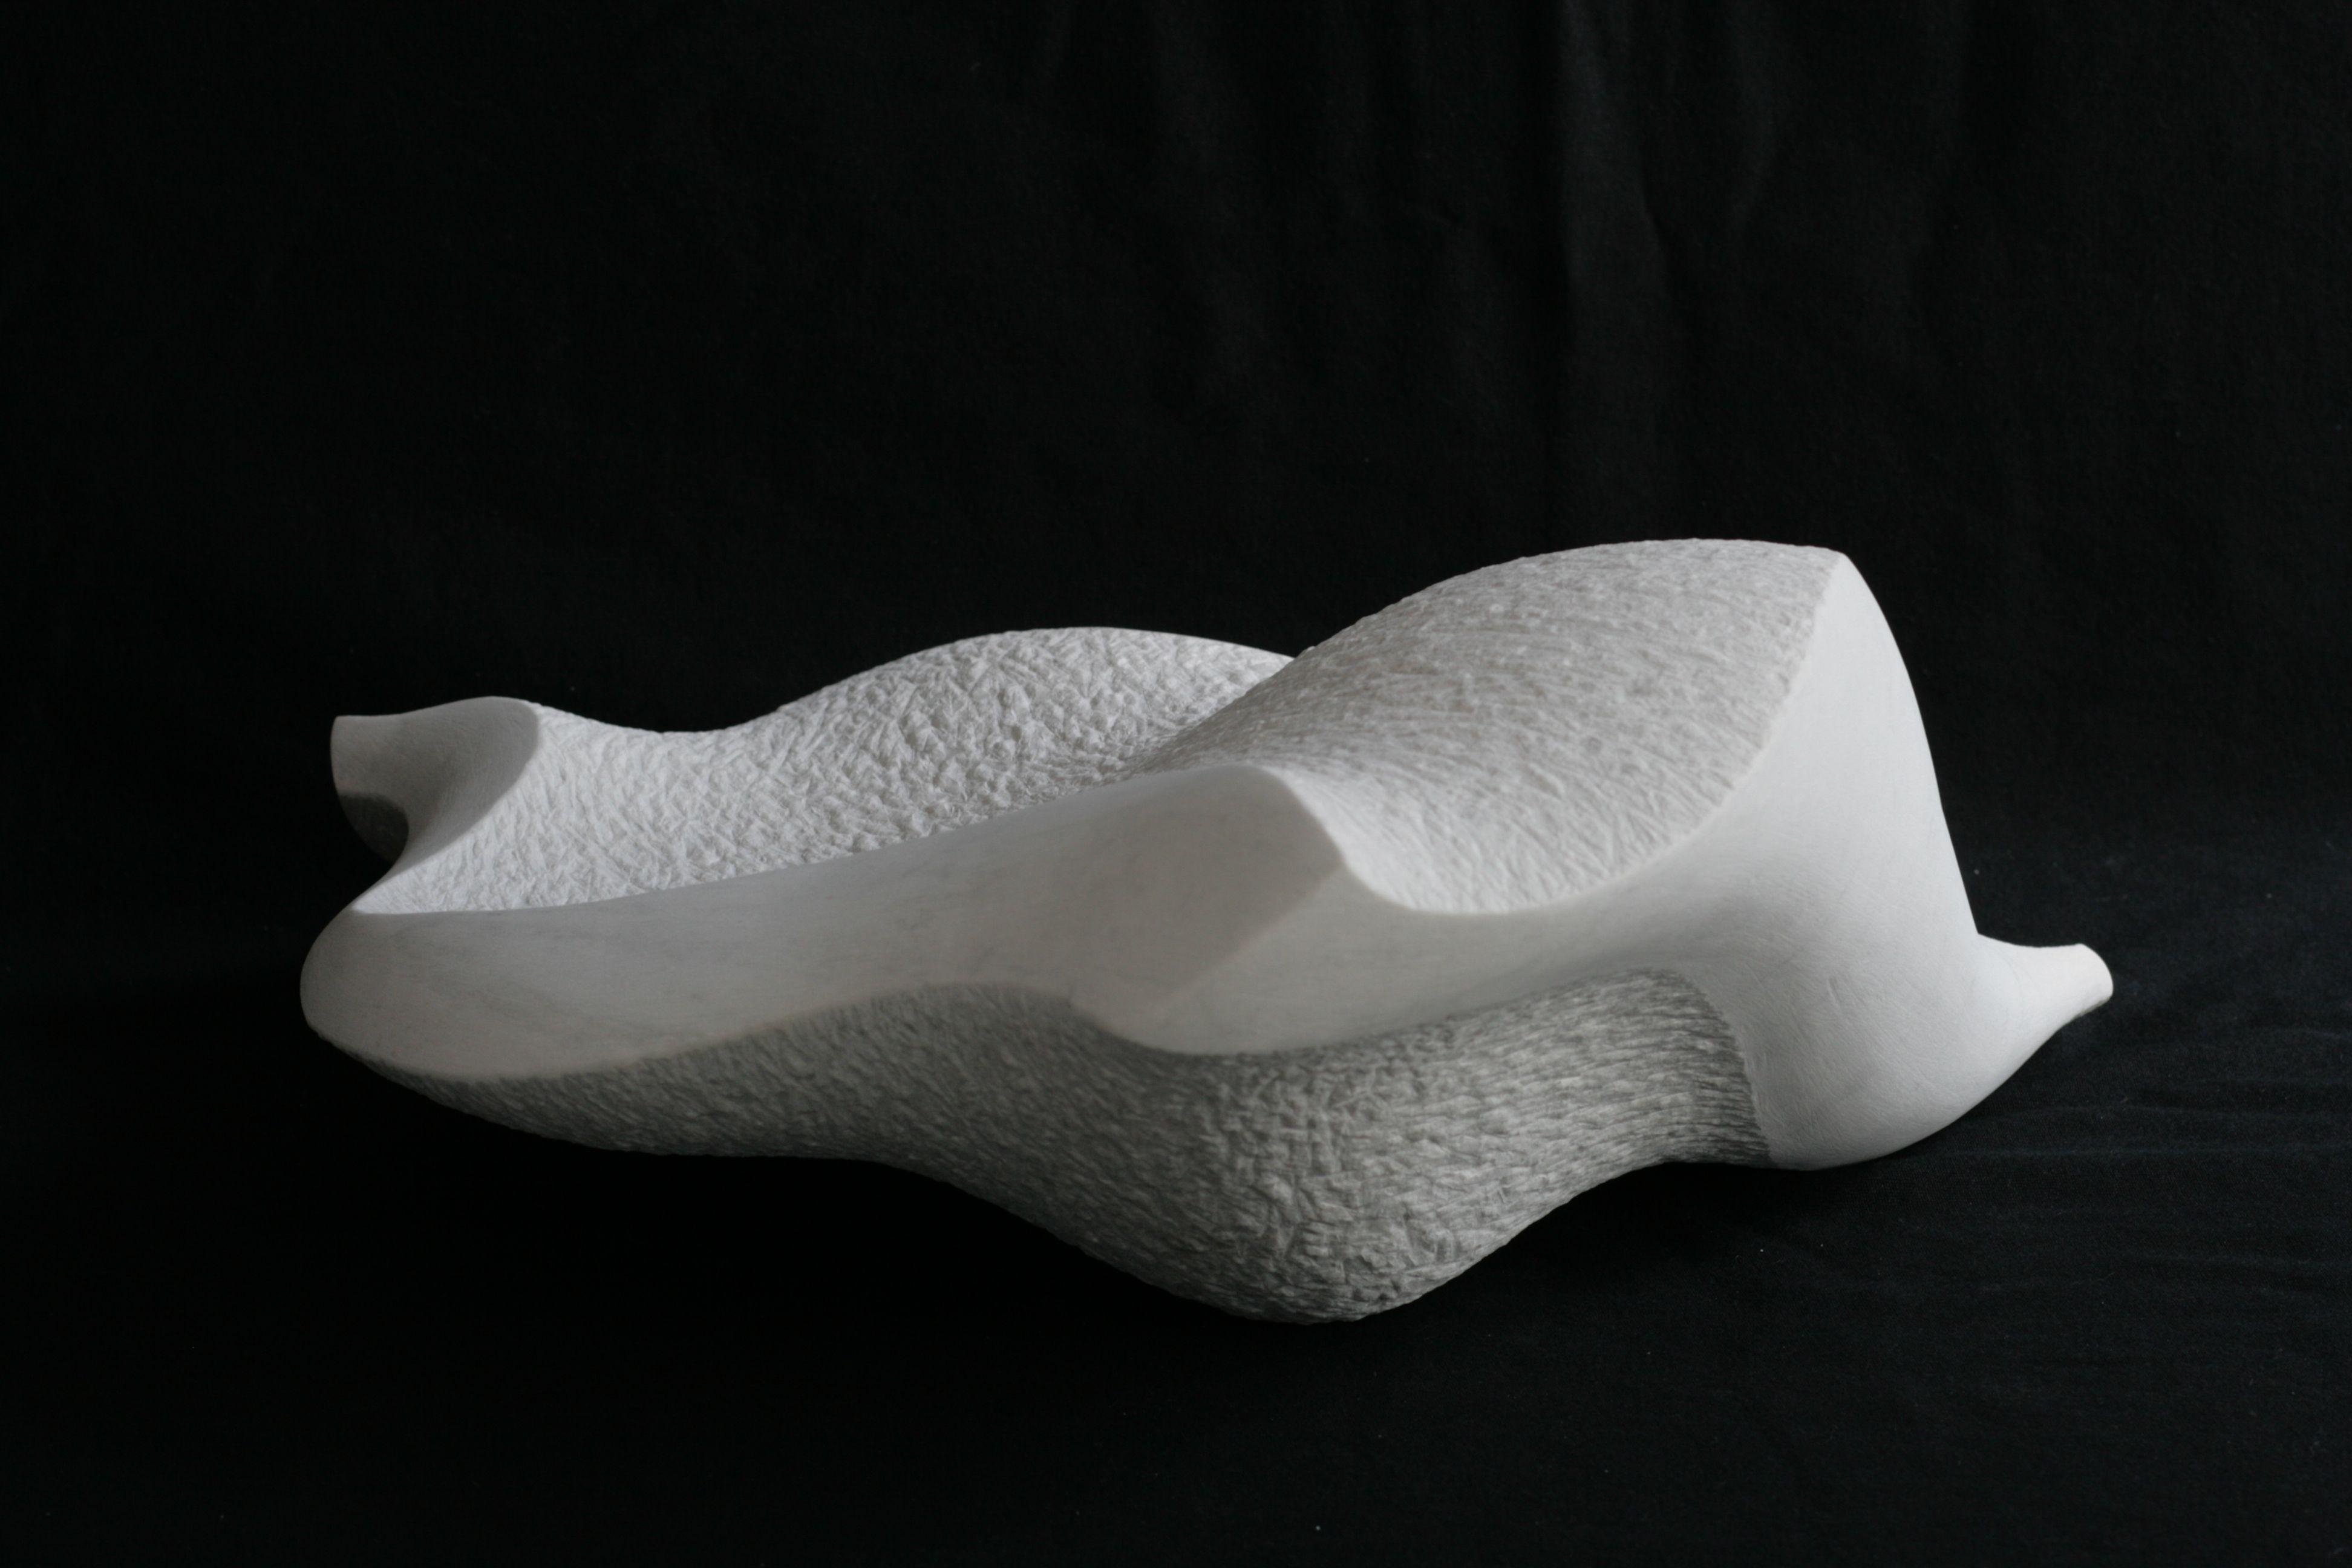 Regina Schnersch, Welle, 2009, Carrara M